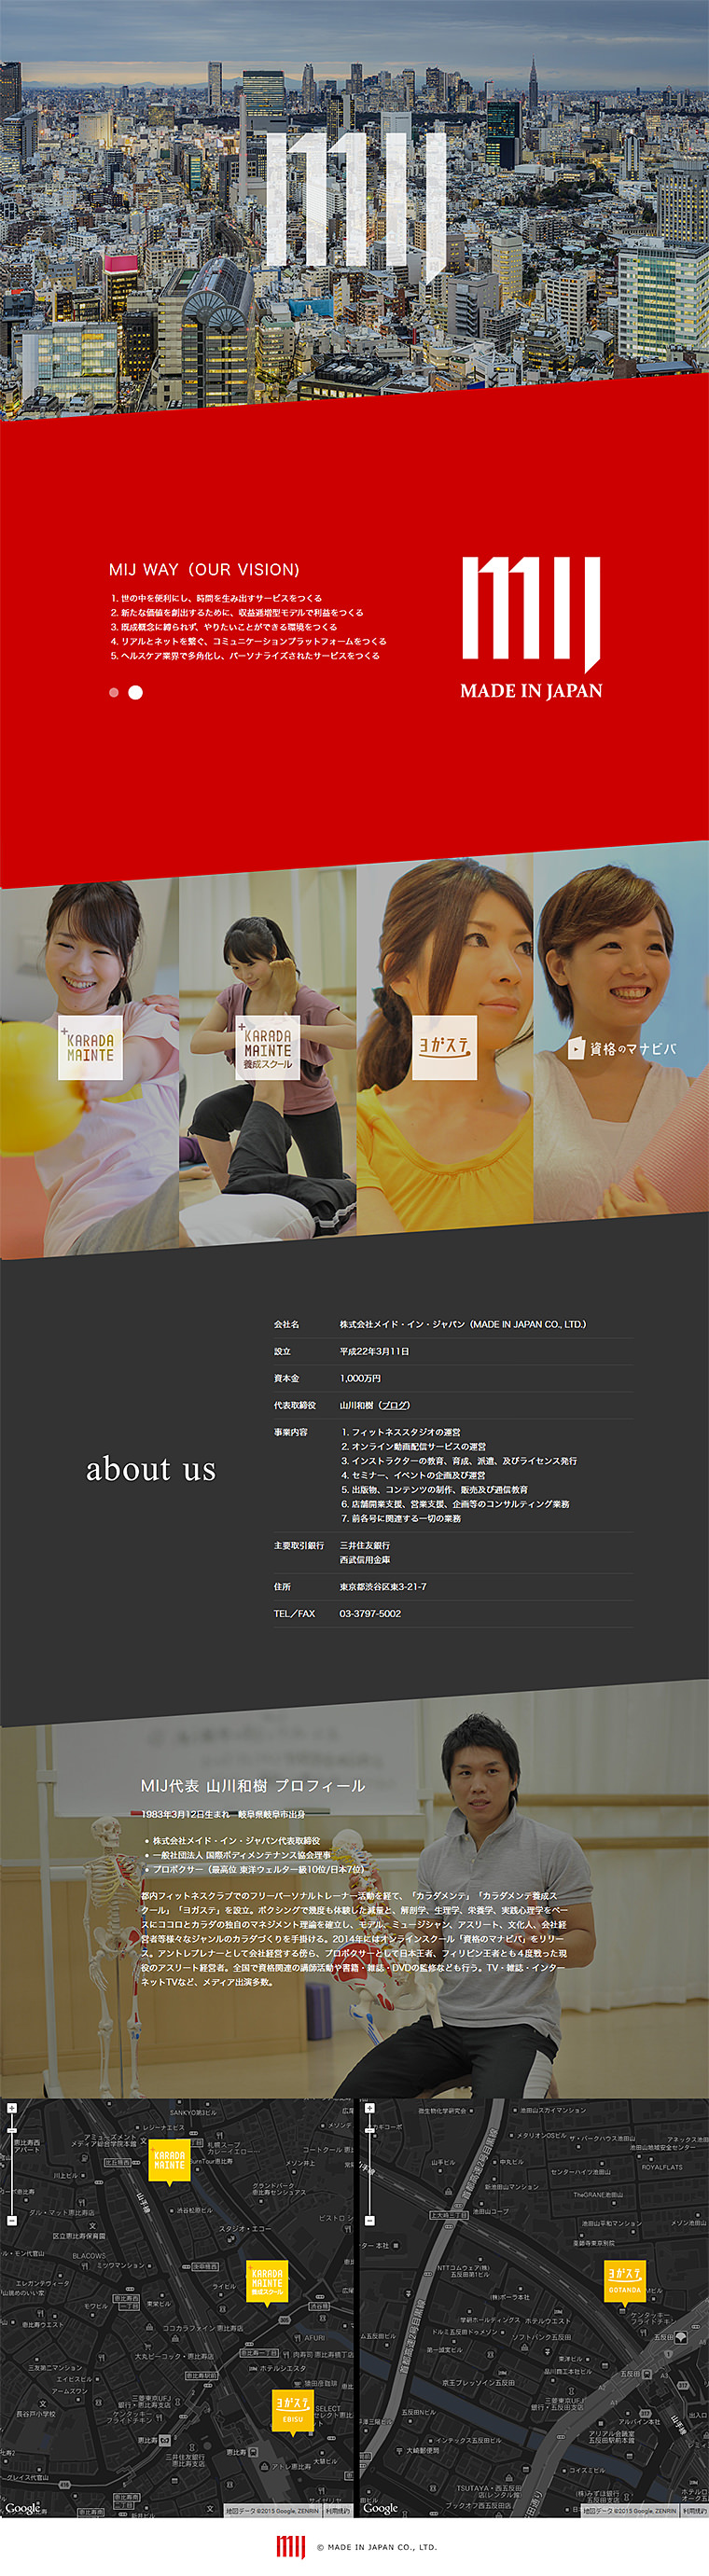 MIJグループ(株式会社メイド・イン・ジャパン)